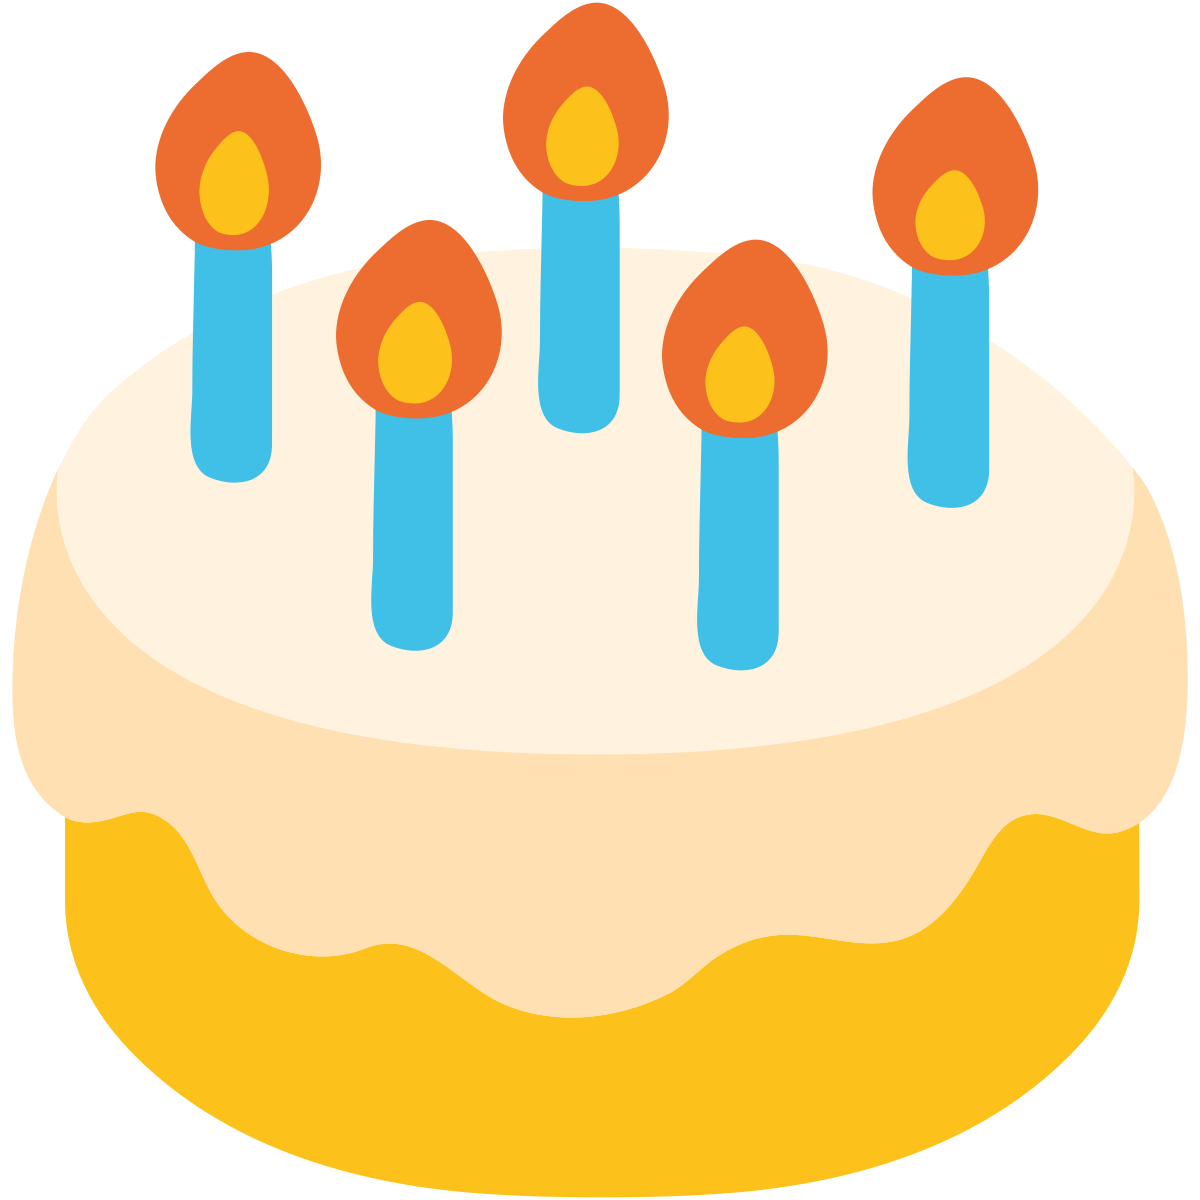 . Emoji clipart birthday cake